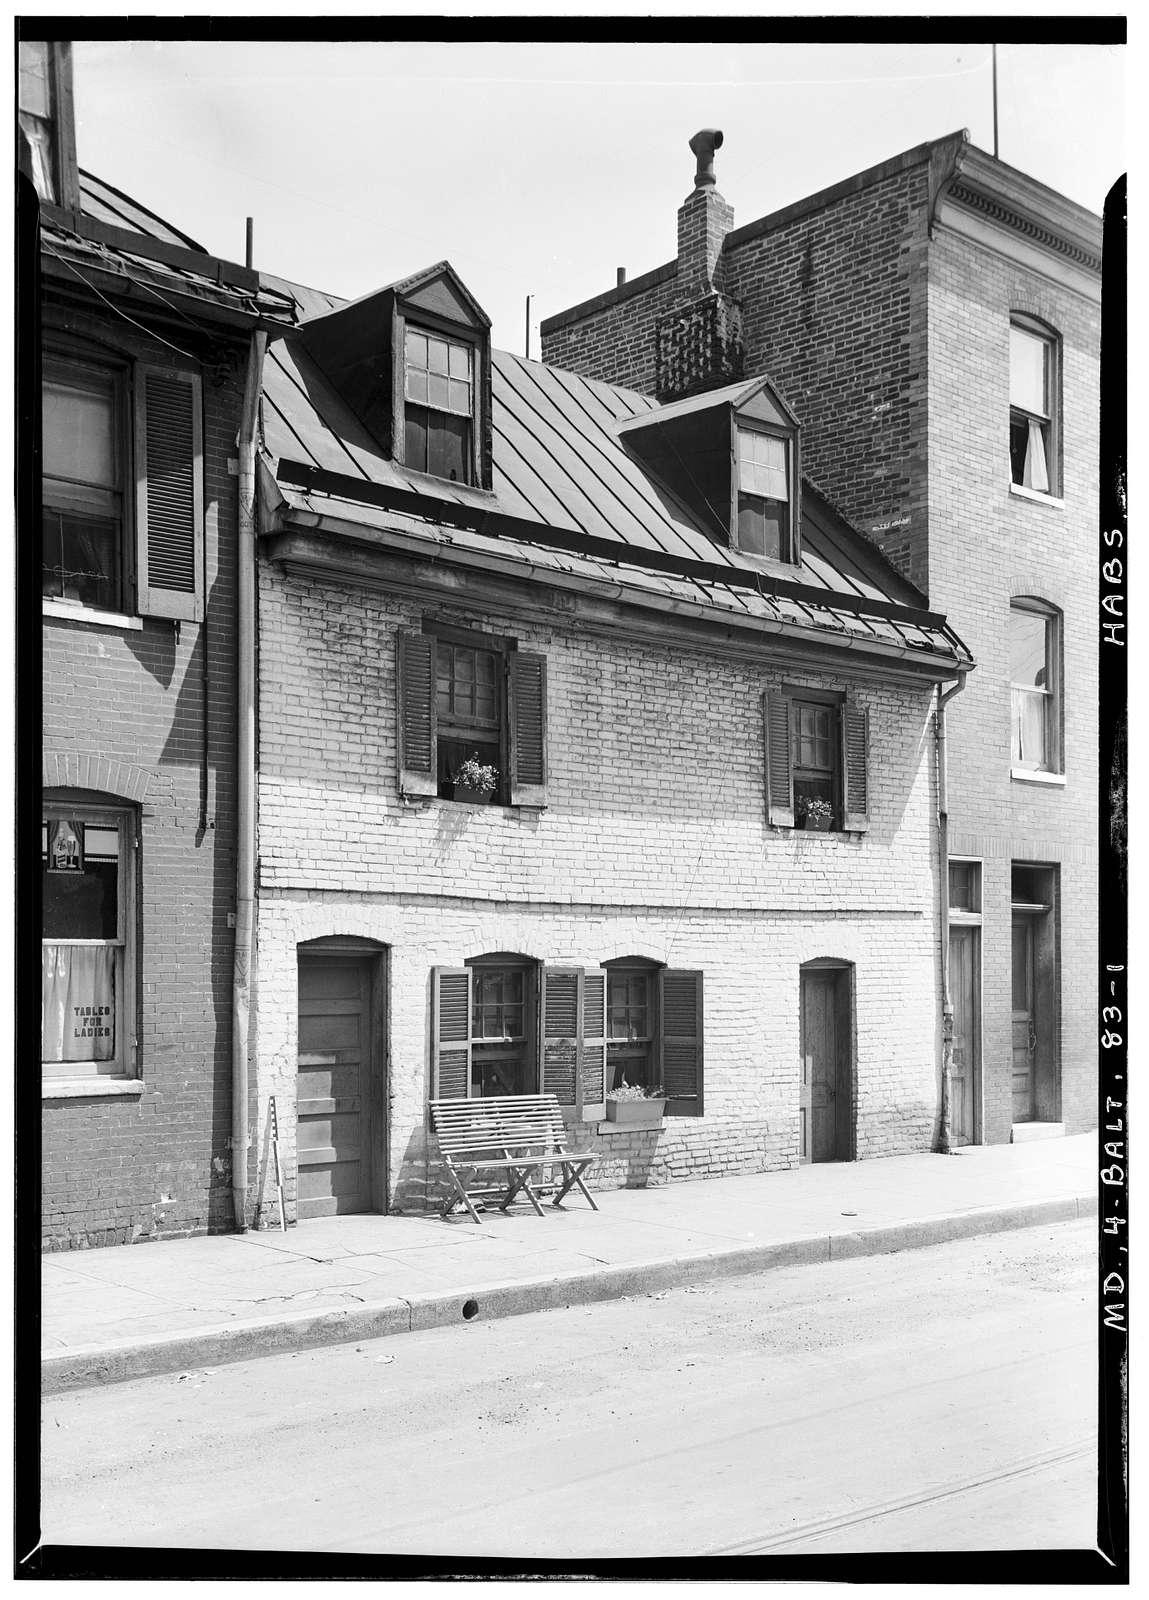 Shakespeare Street, 1600 Block (Brick Cottage), Baltimore, Independent City, MD